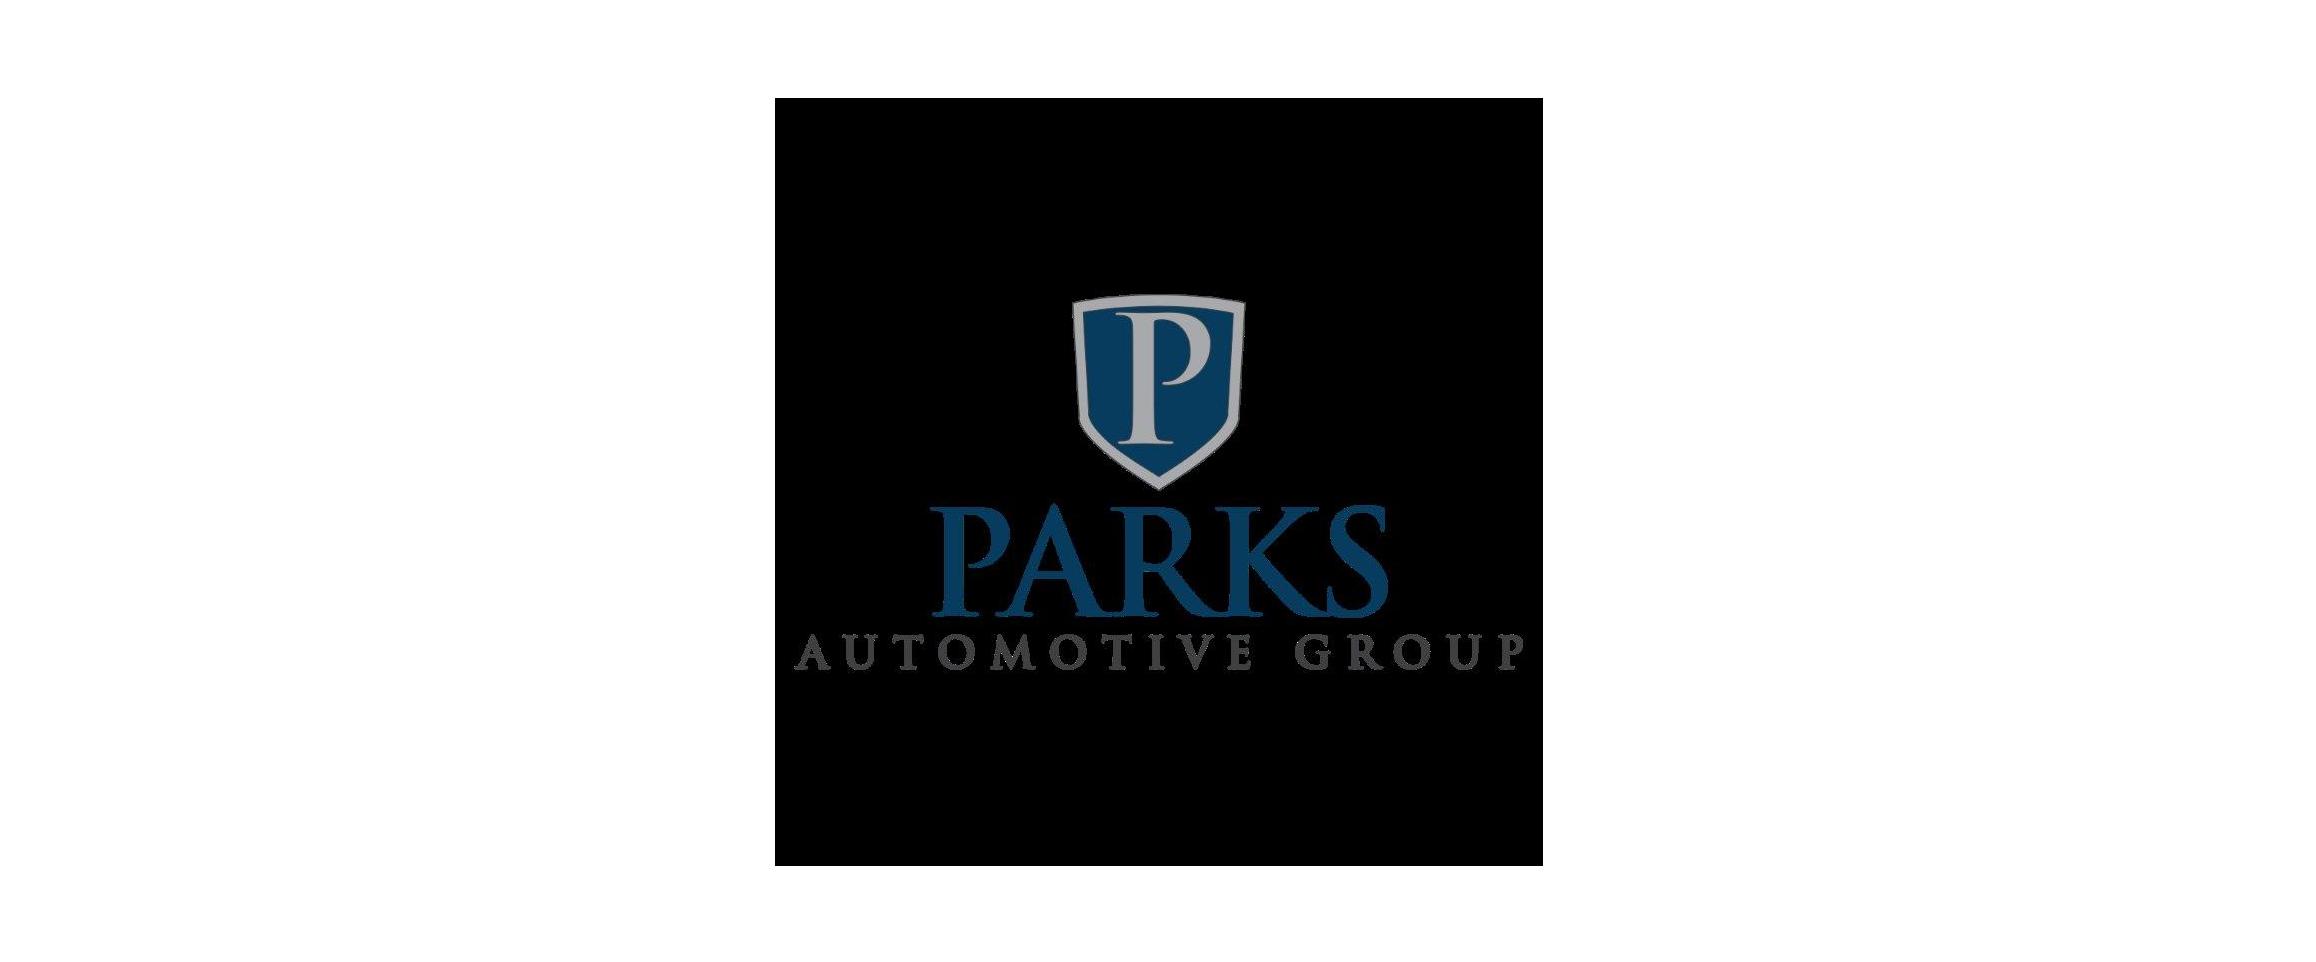 Parks_AutomotiveGroup_3c.jpg